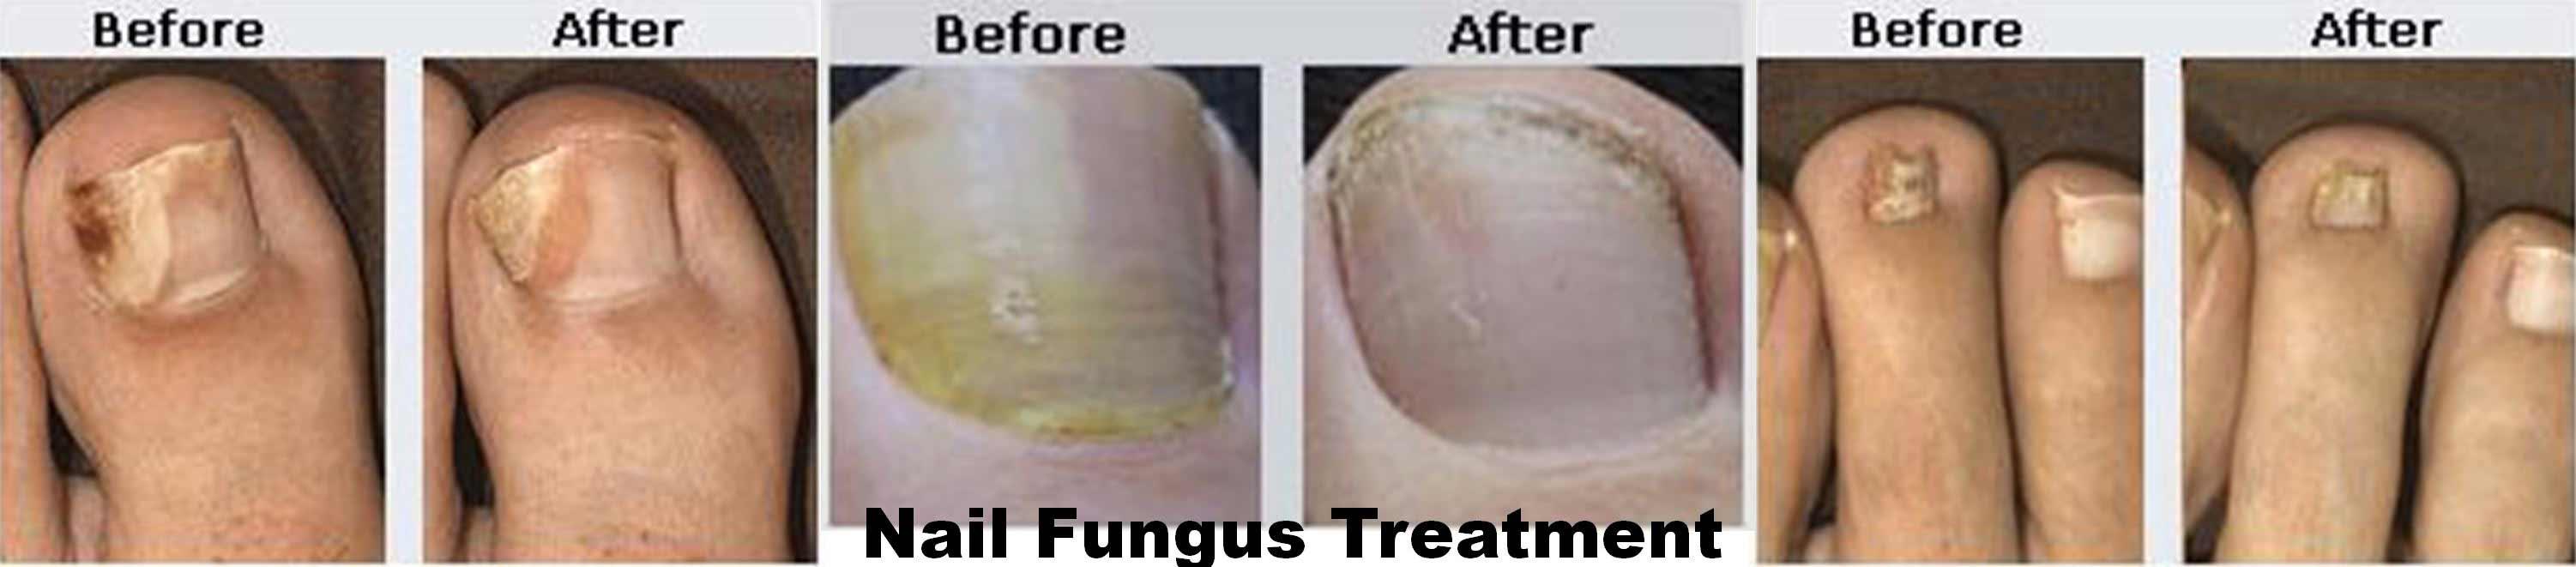 coastal-valley-dermatology-carmel-nail-fungus-laser-treatment-photo